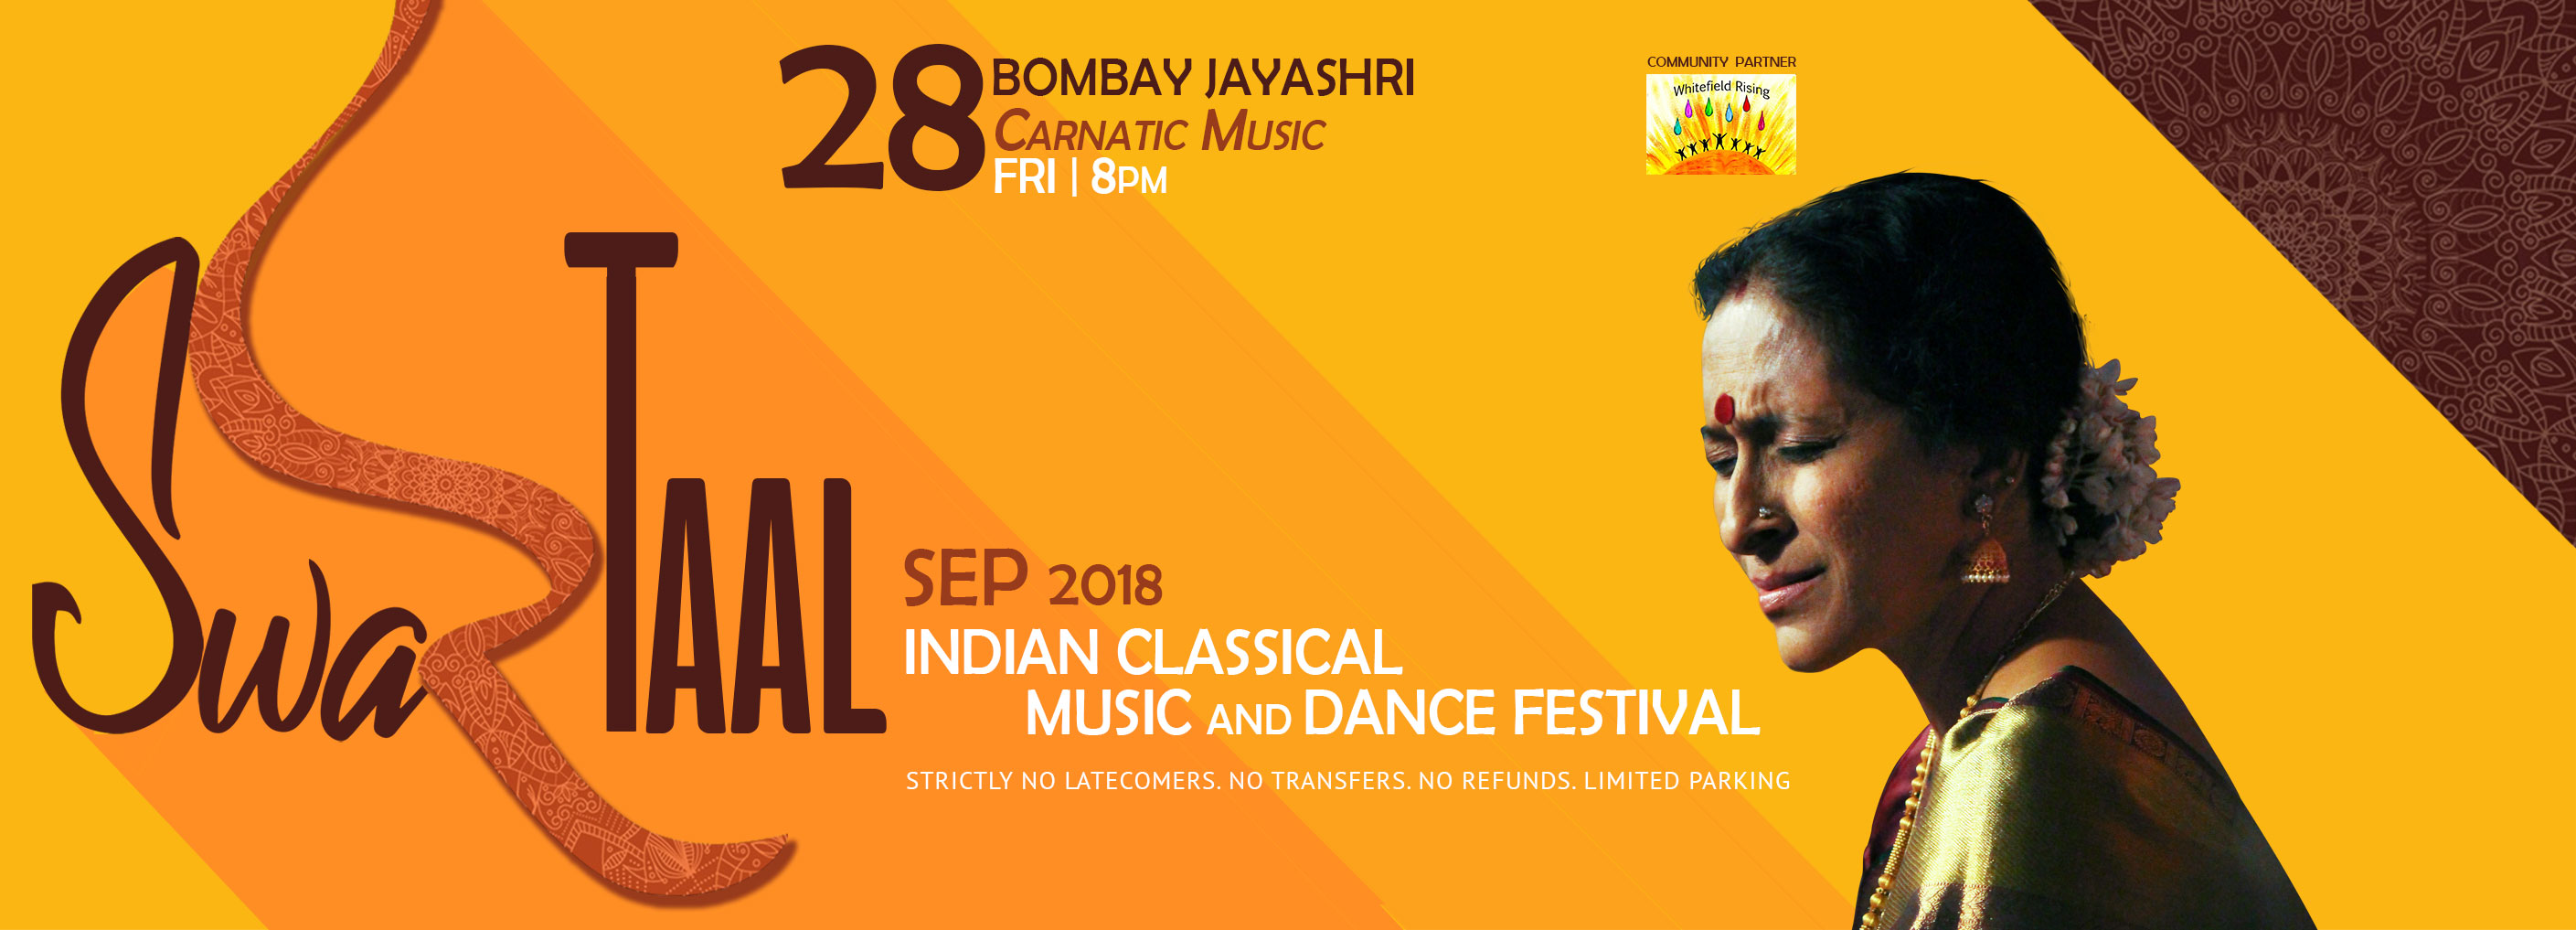 SwarTaal- Bombay Jayashri